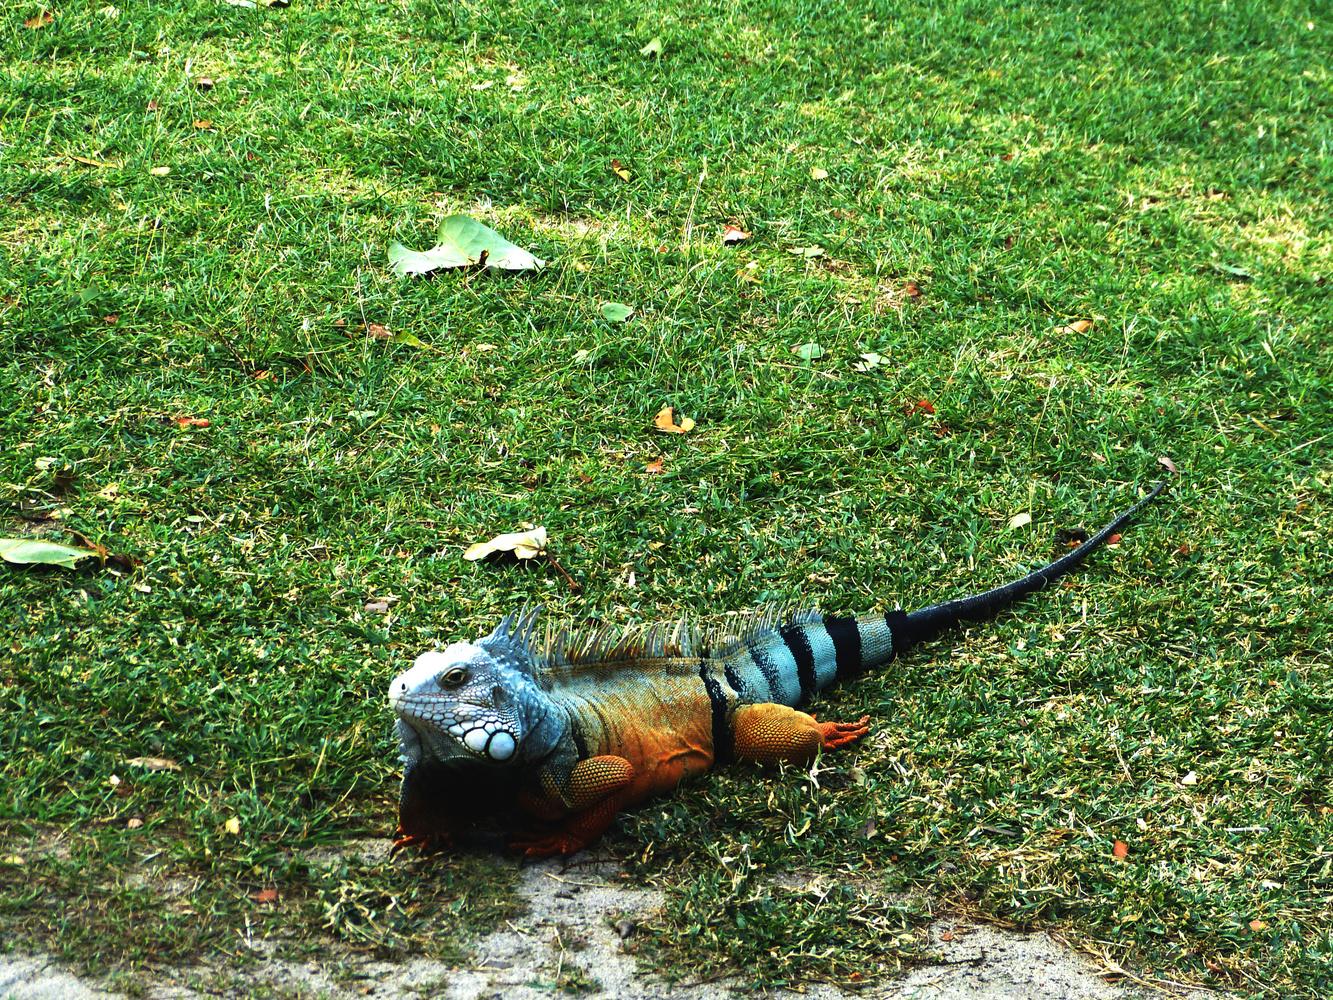 Green iguana of Puerto Rico by Rohit Burra